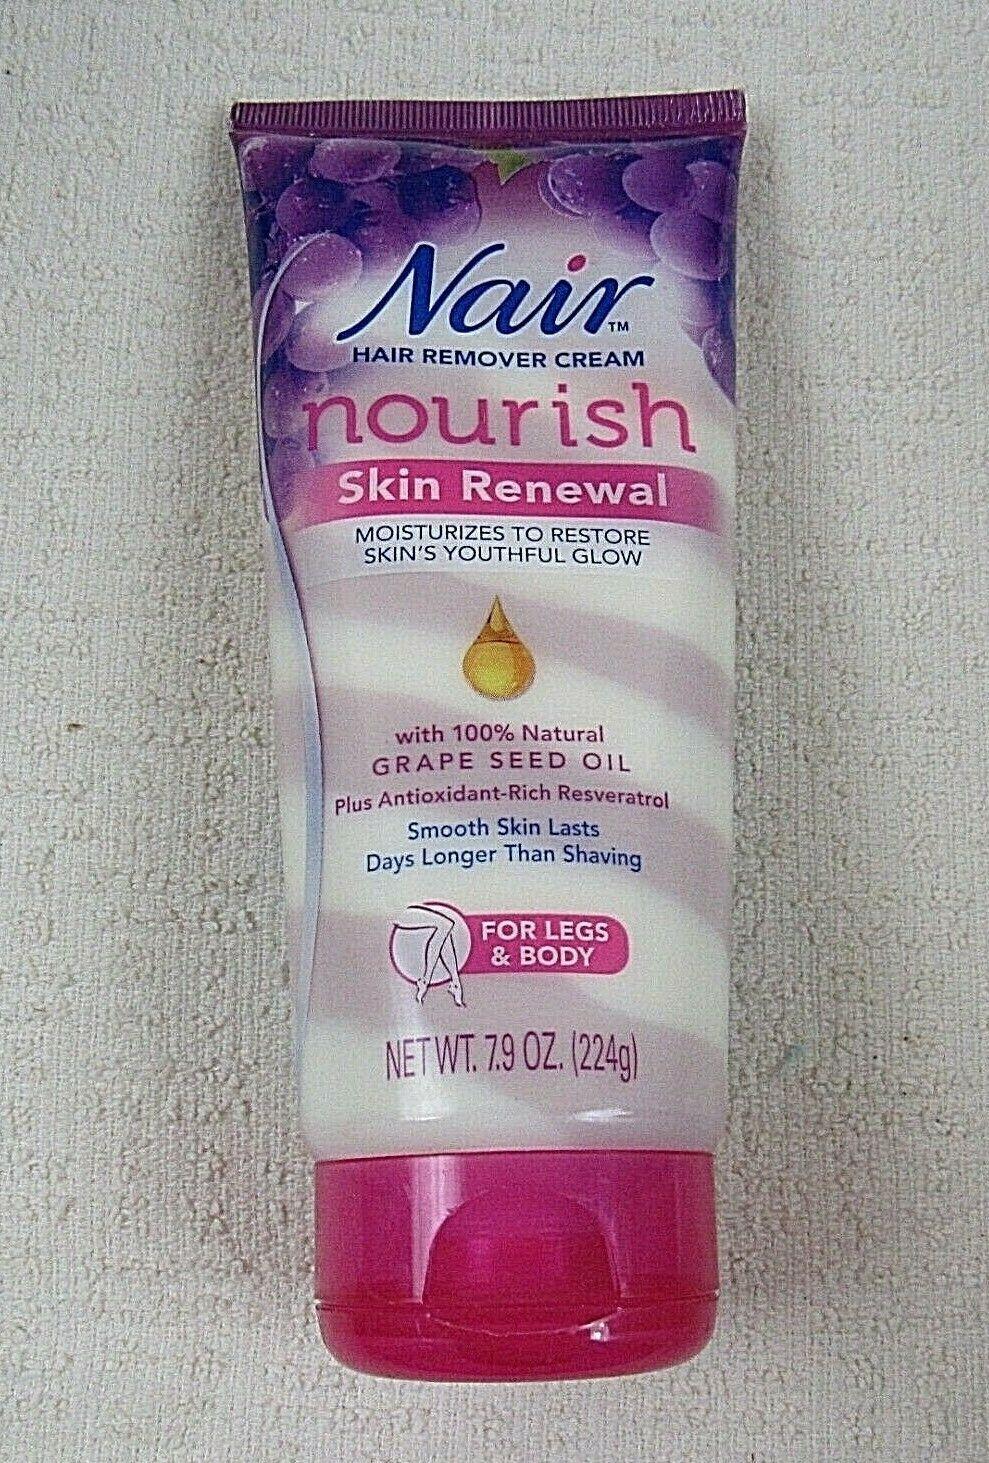 Nair Hair Remover Cream Nourish Skin Renewal And 24 Similar Items